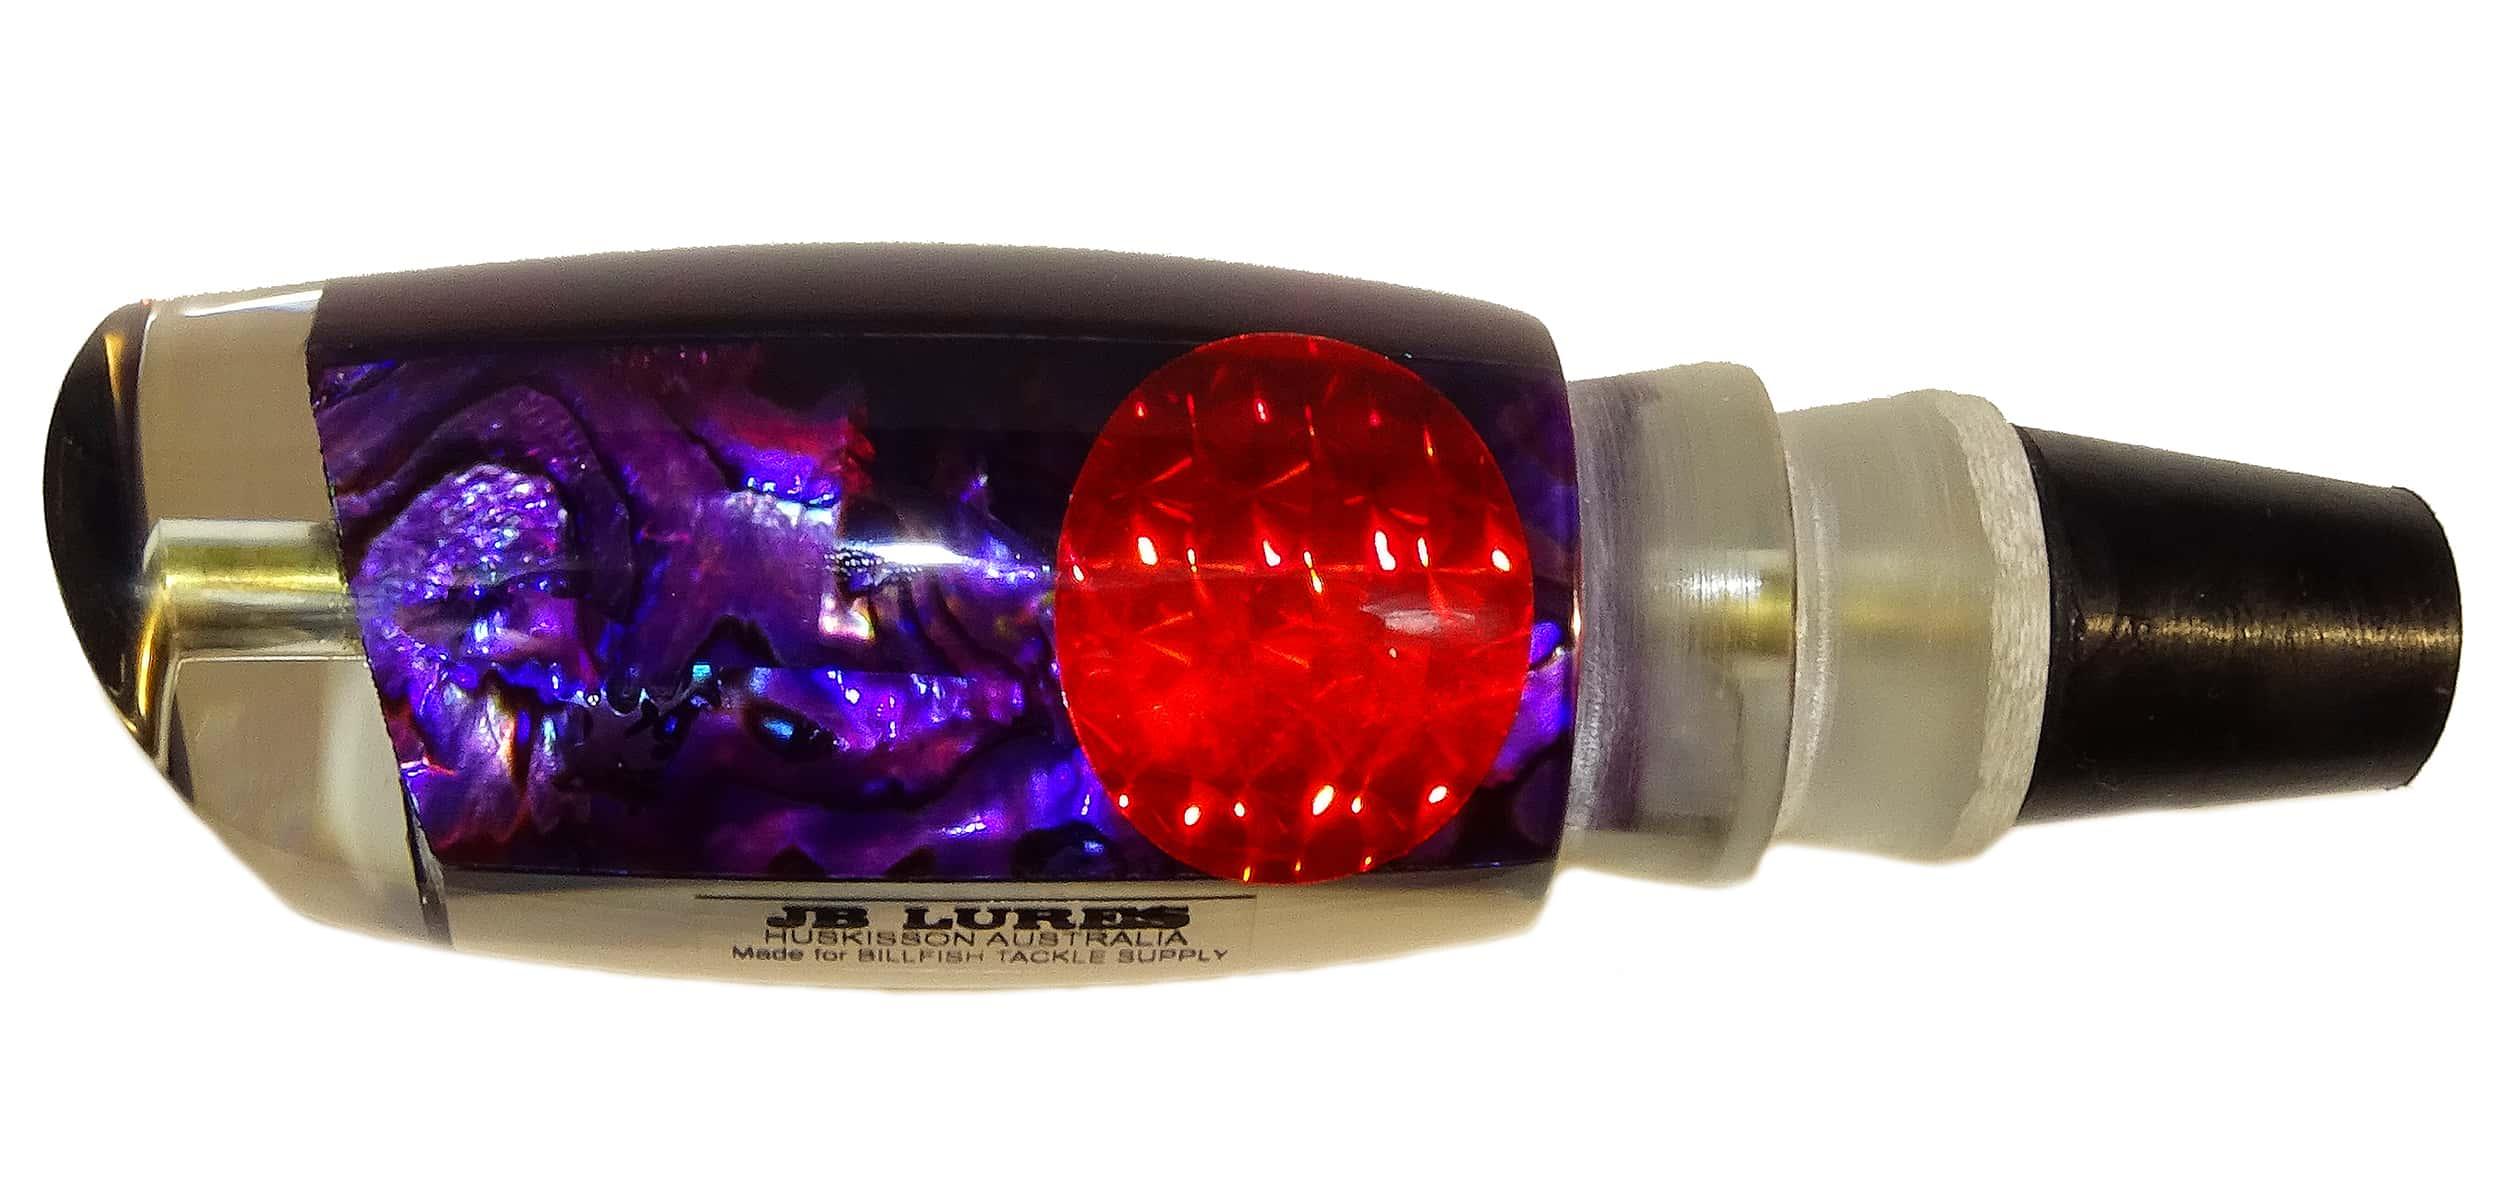 JB Lures - Chopper Series - Head - Purple Paua Shell